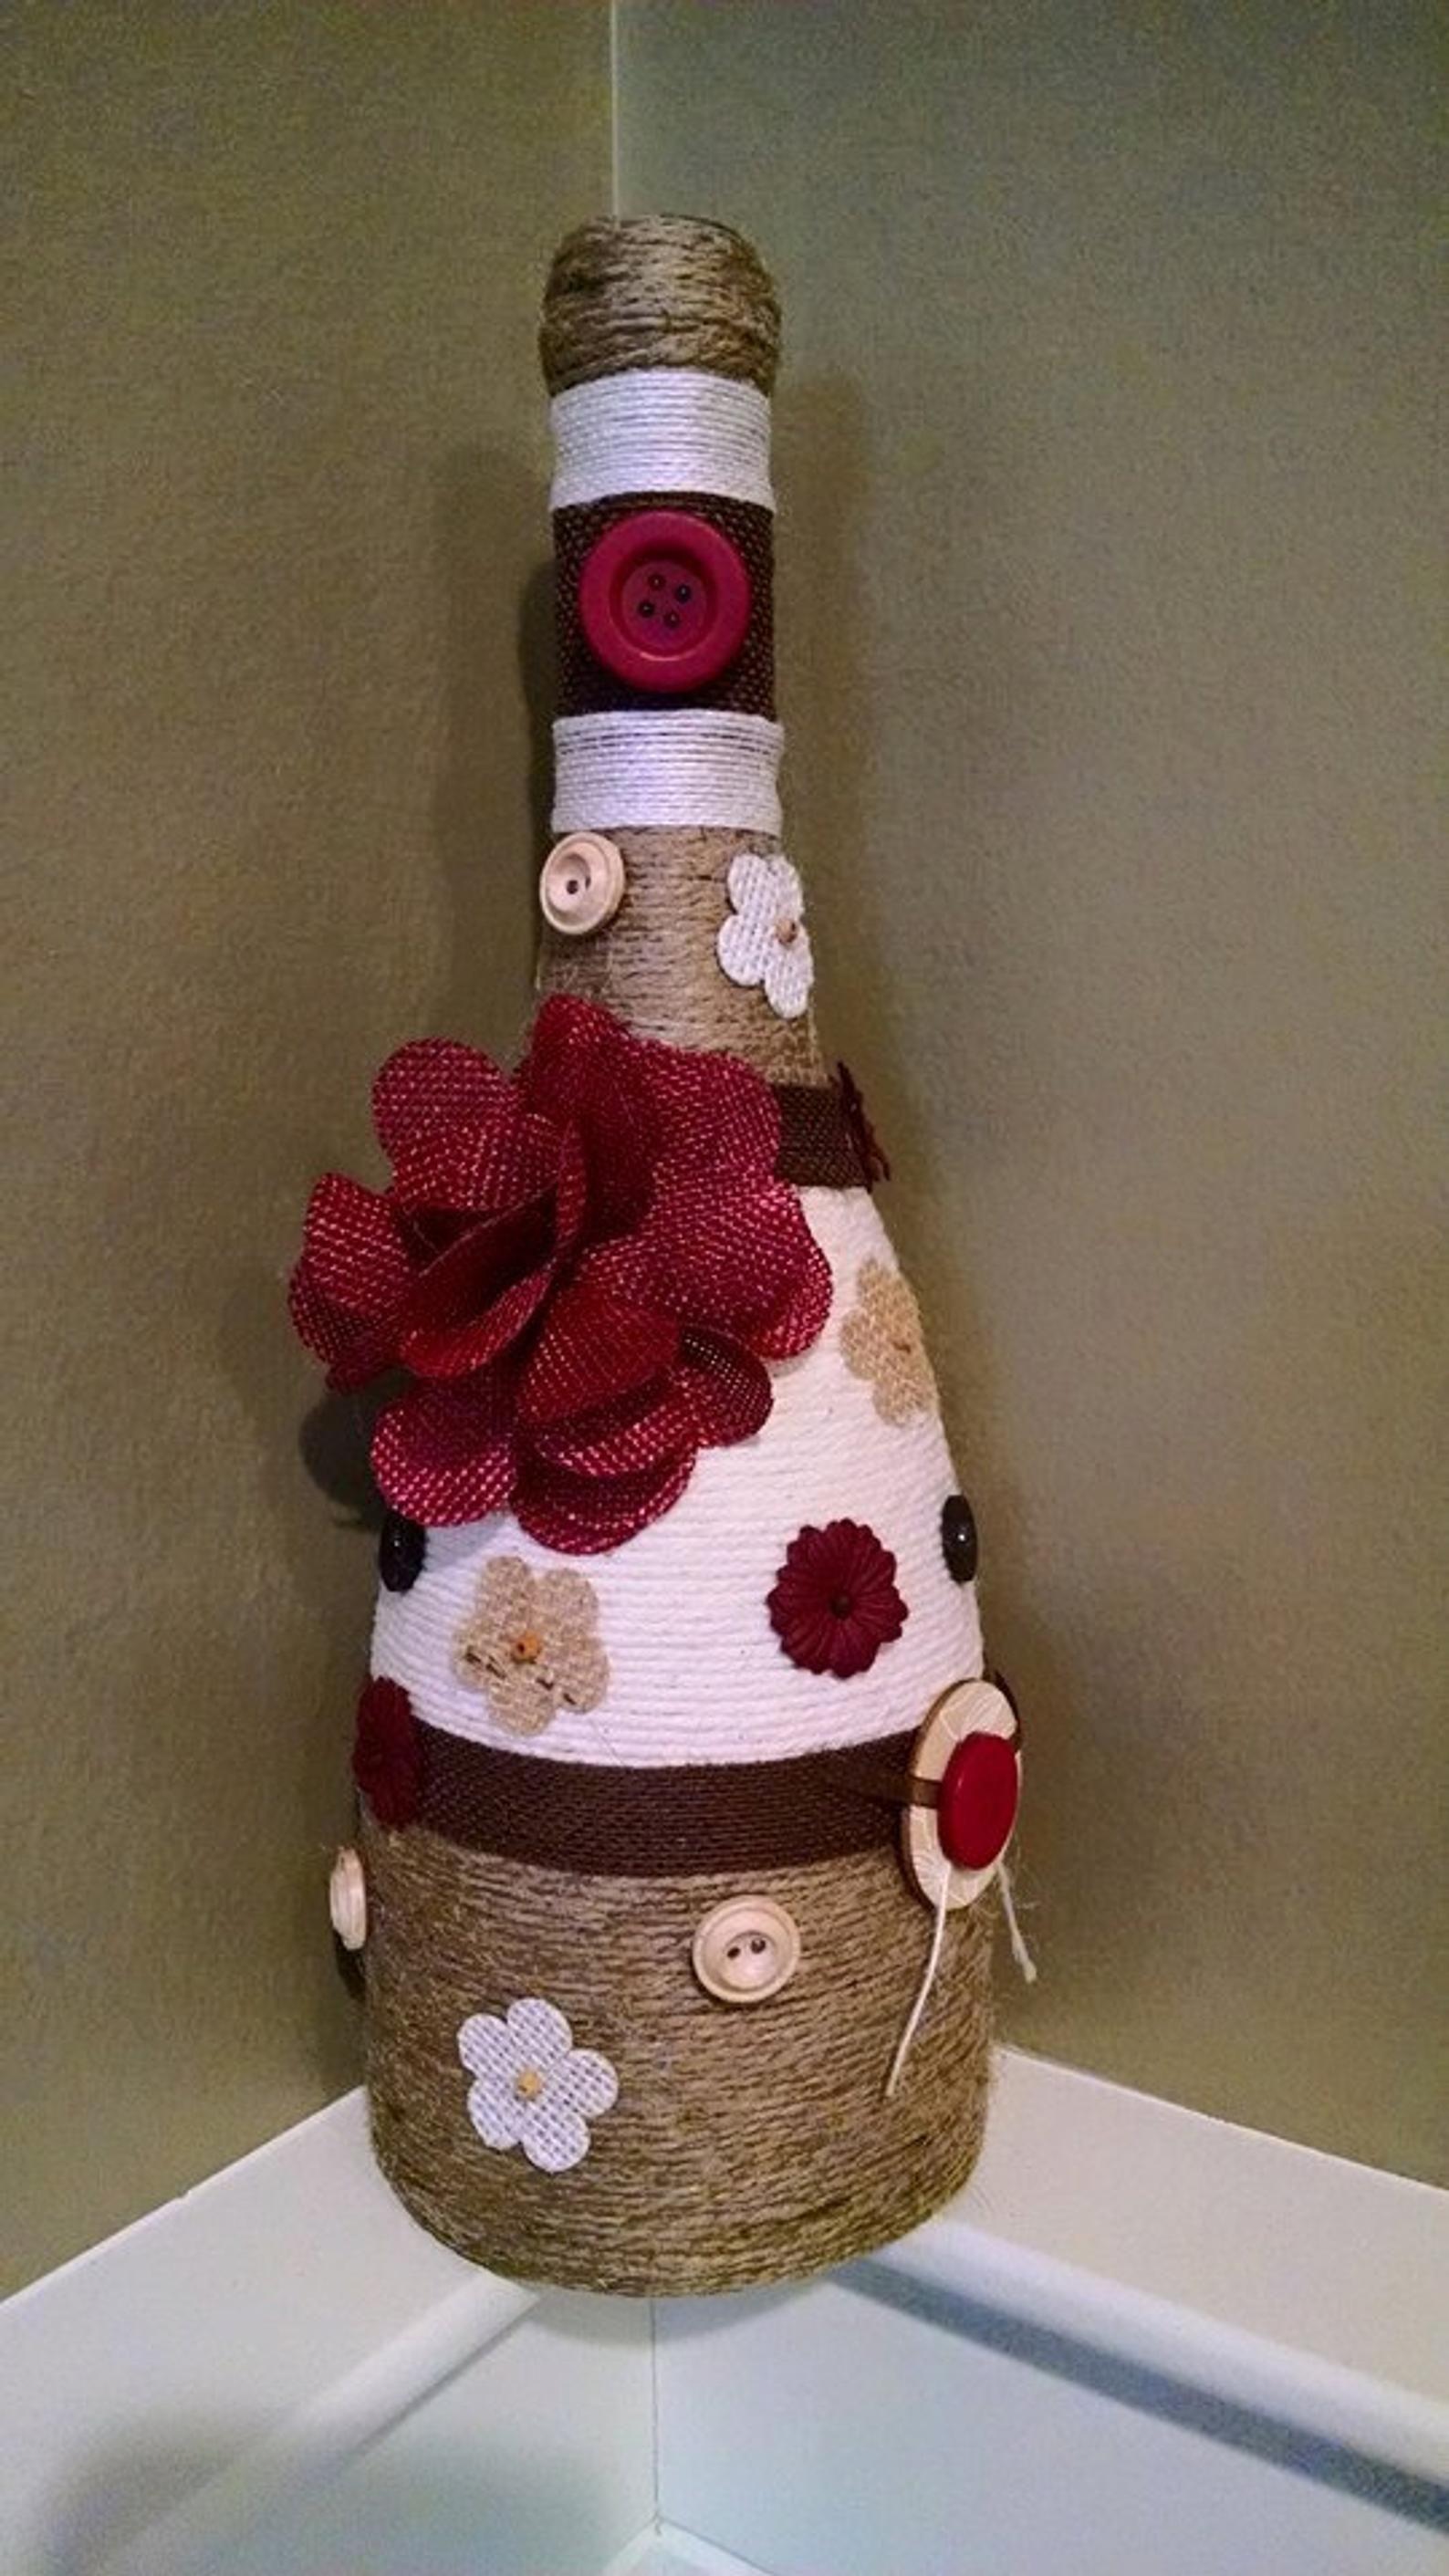 Wine Bottle Decor Etsy In 2020 Bottles Decoration Wine Bottle Diy Crafts Wine Bottle Crafts